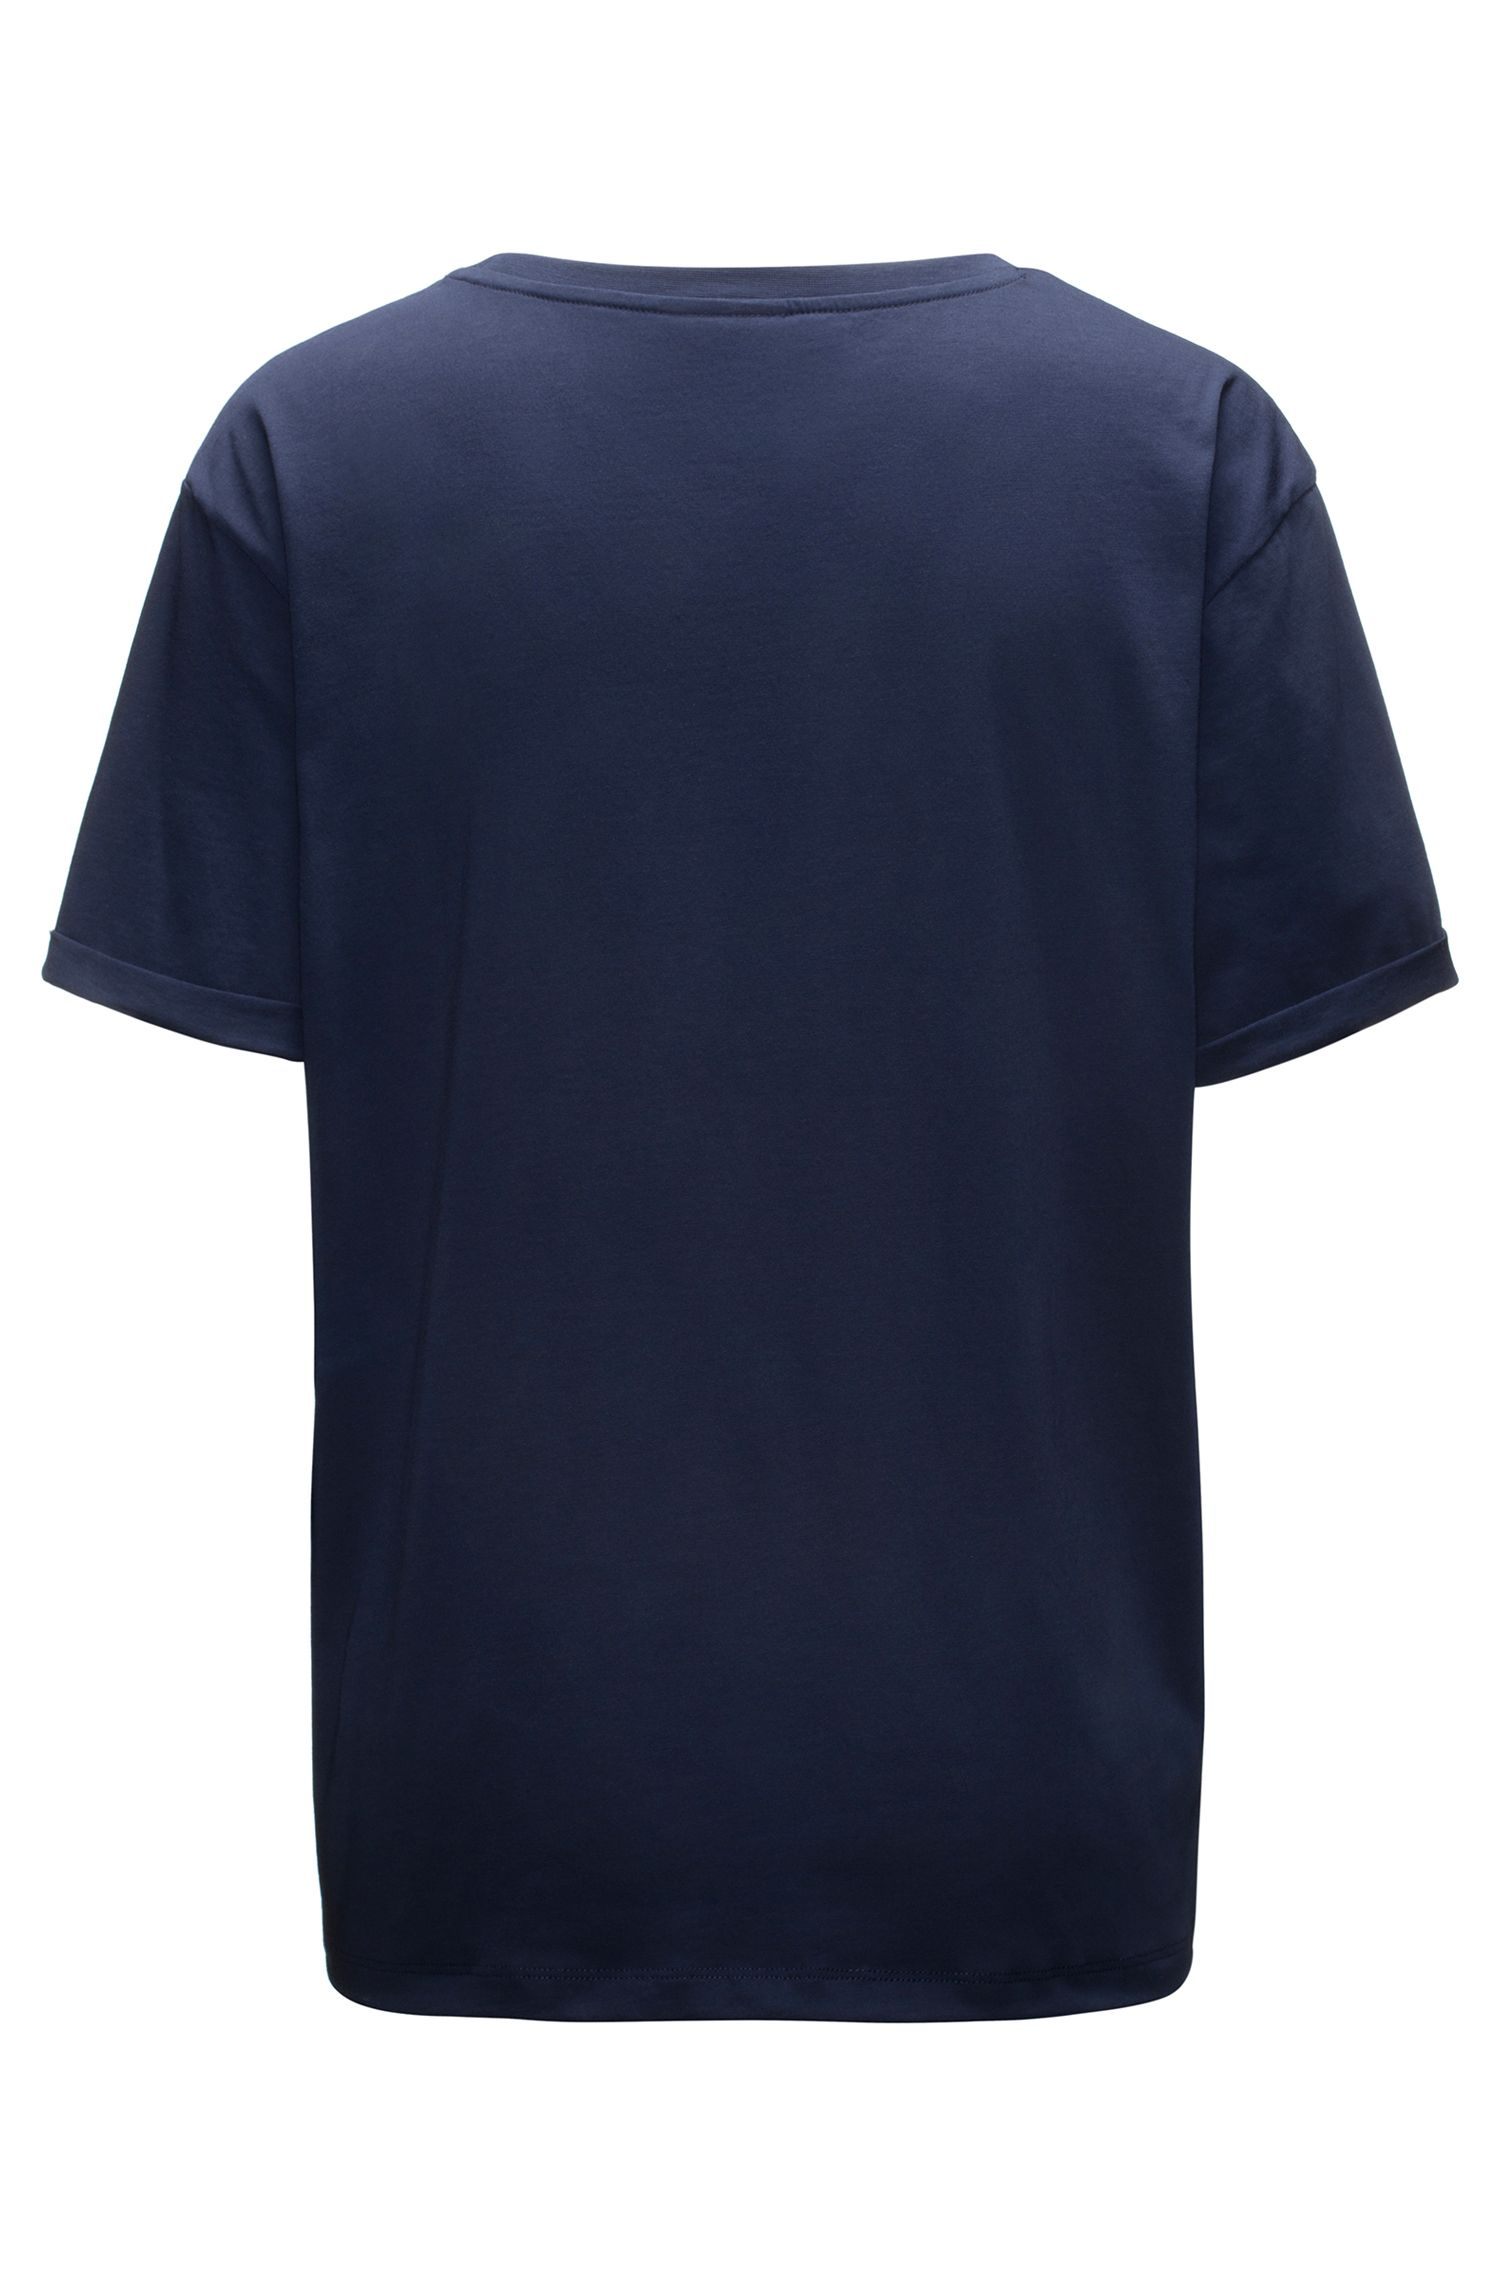 Short-sleeved cotton T-shirt with metallic reversed logo